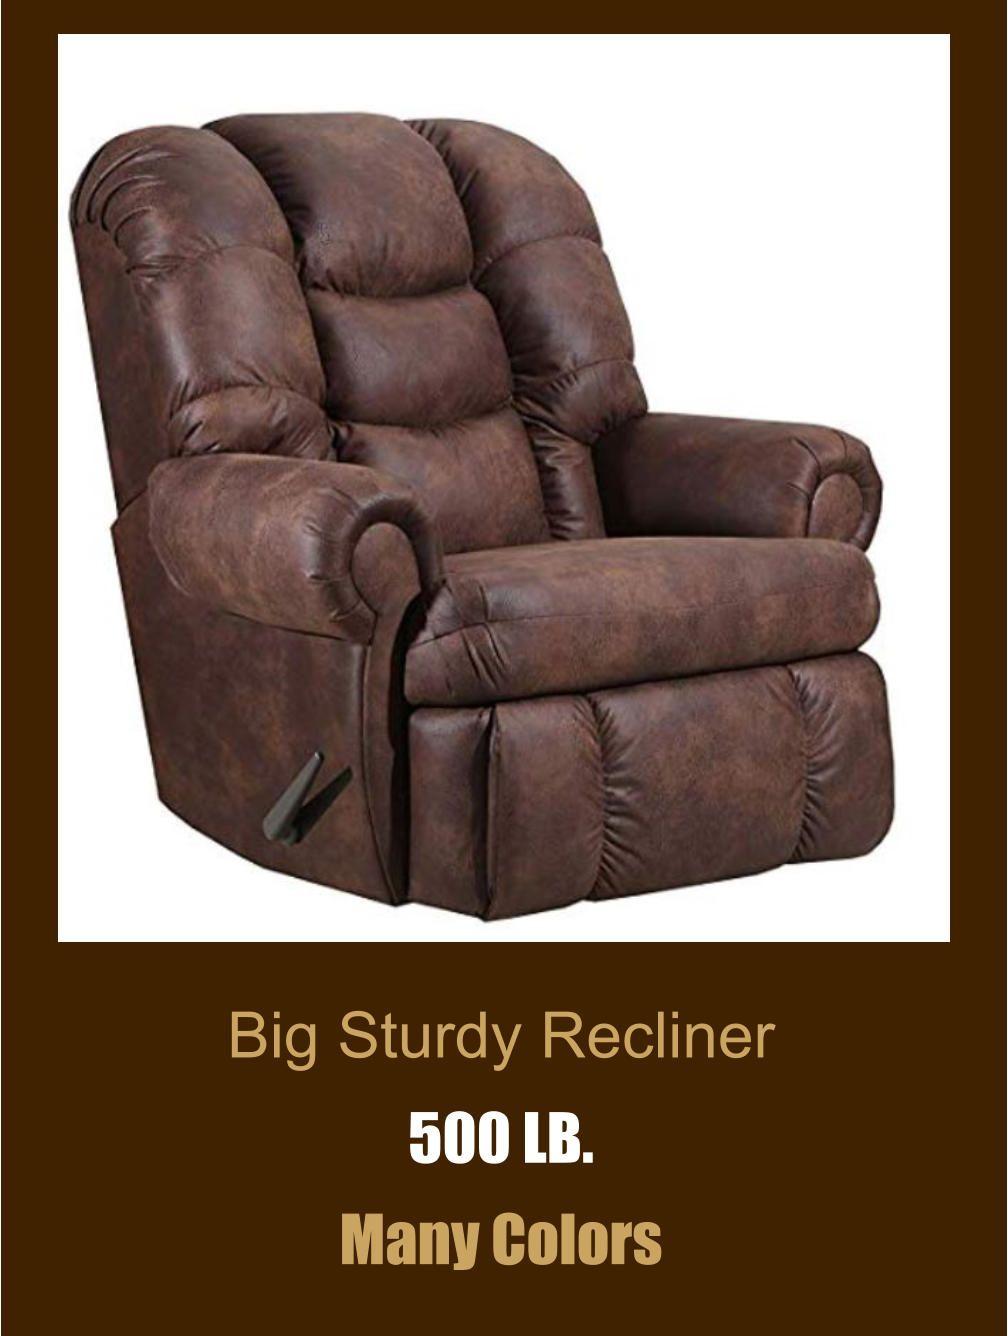 Big Sturdy Recliner Recliner Chair Chair Recliner